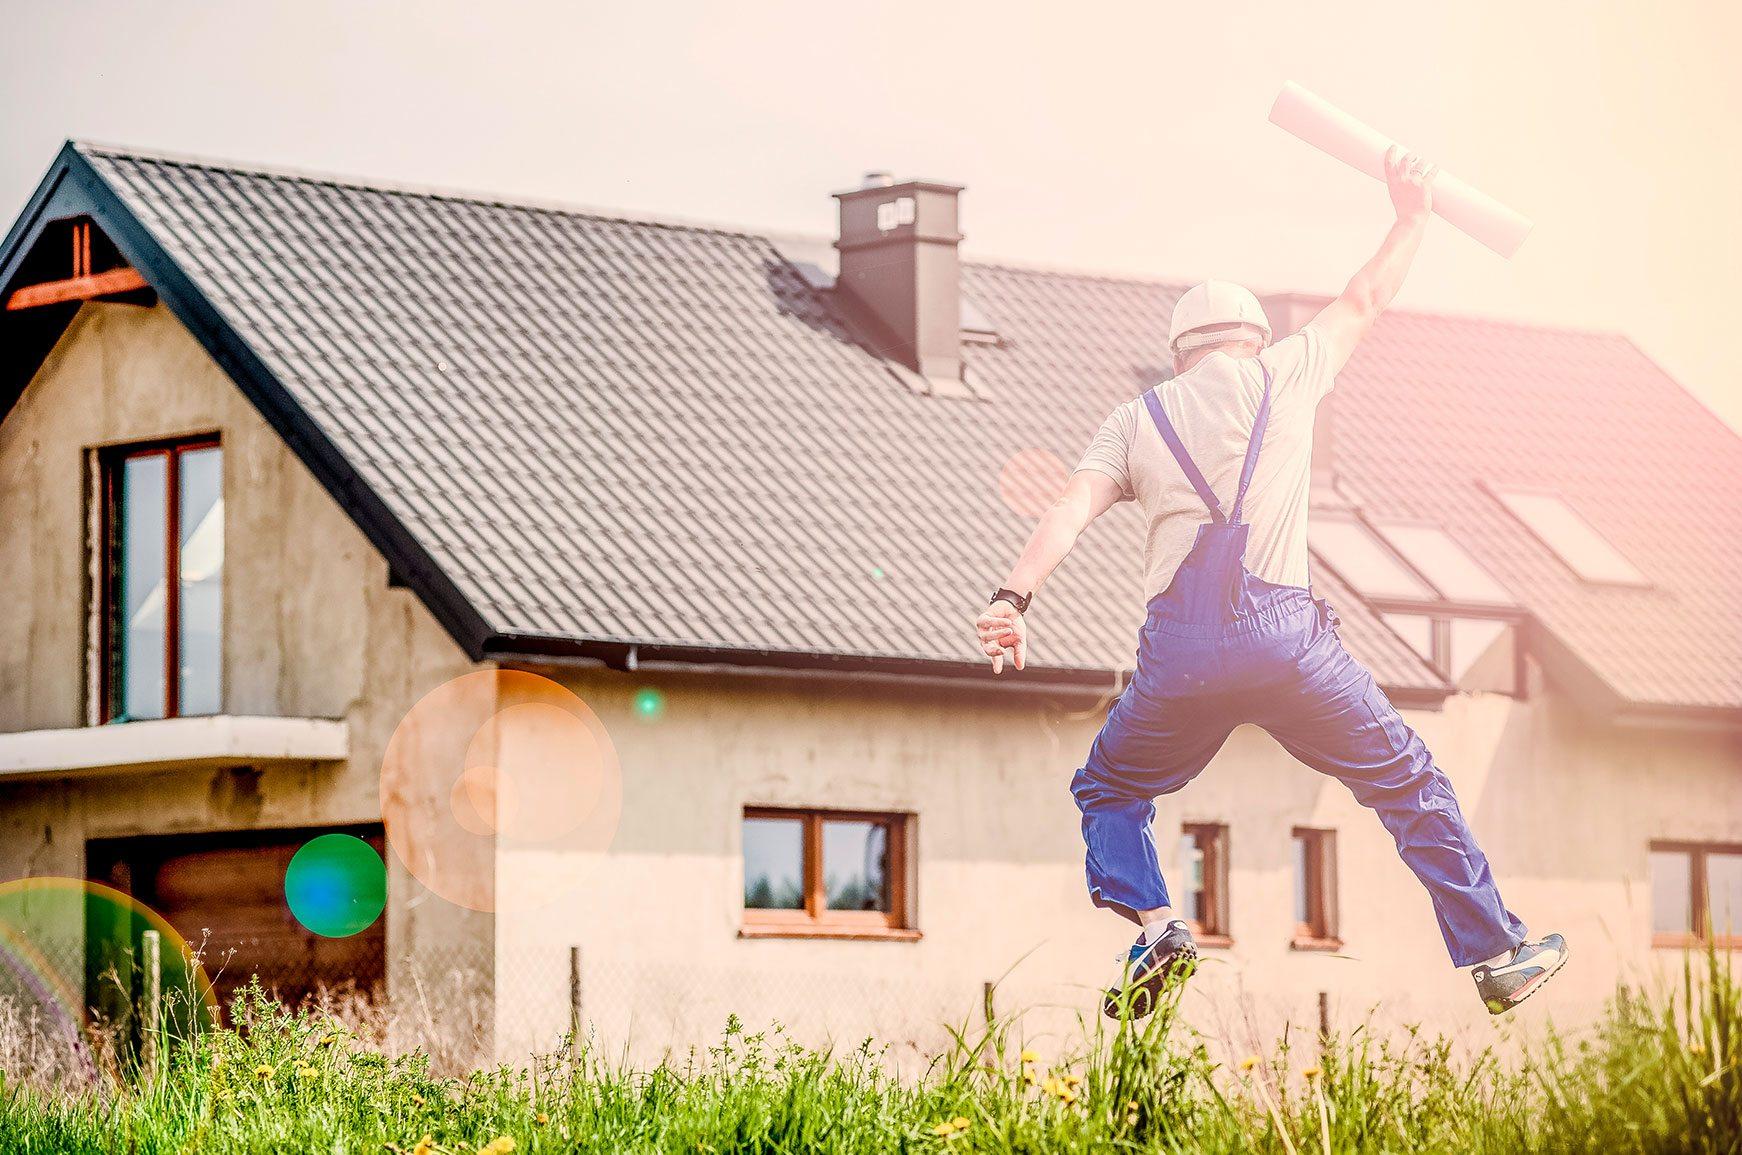 Jumping Construction Worker Near Home